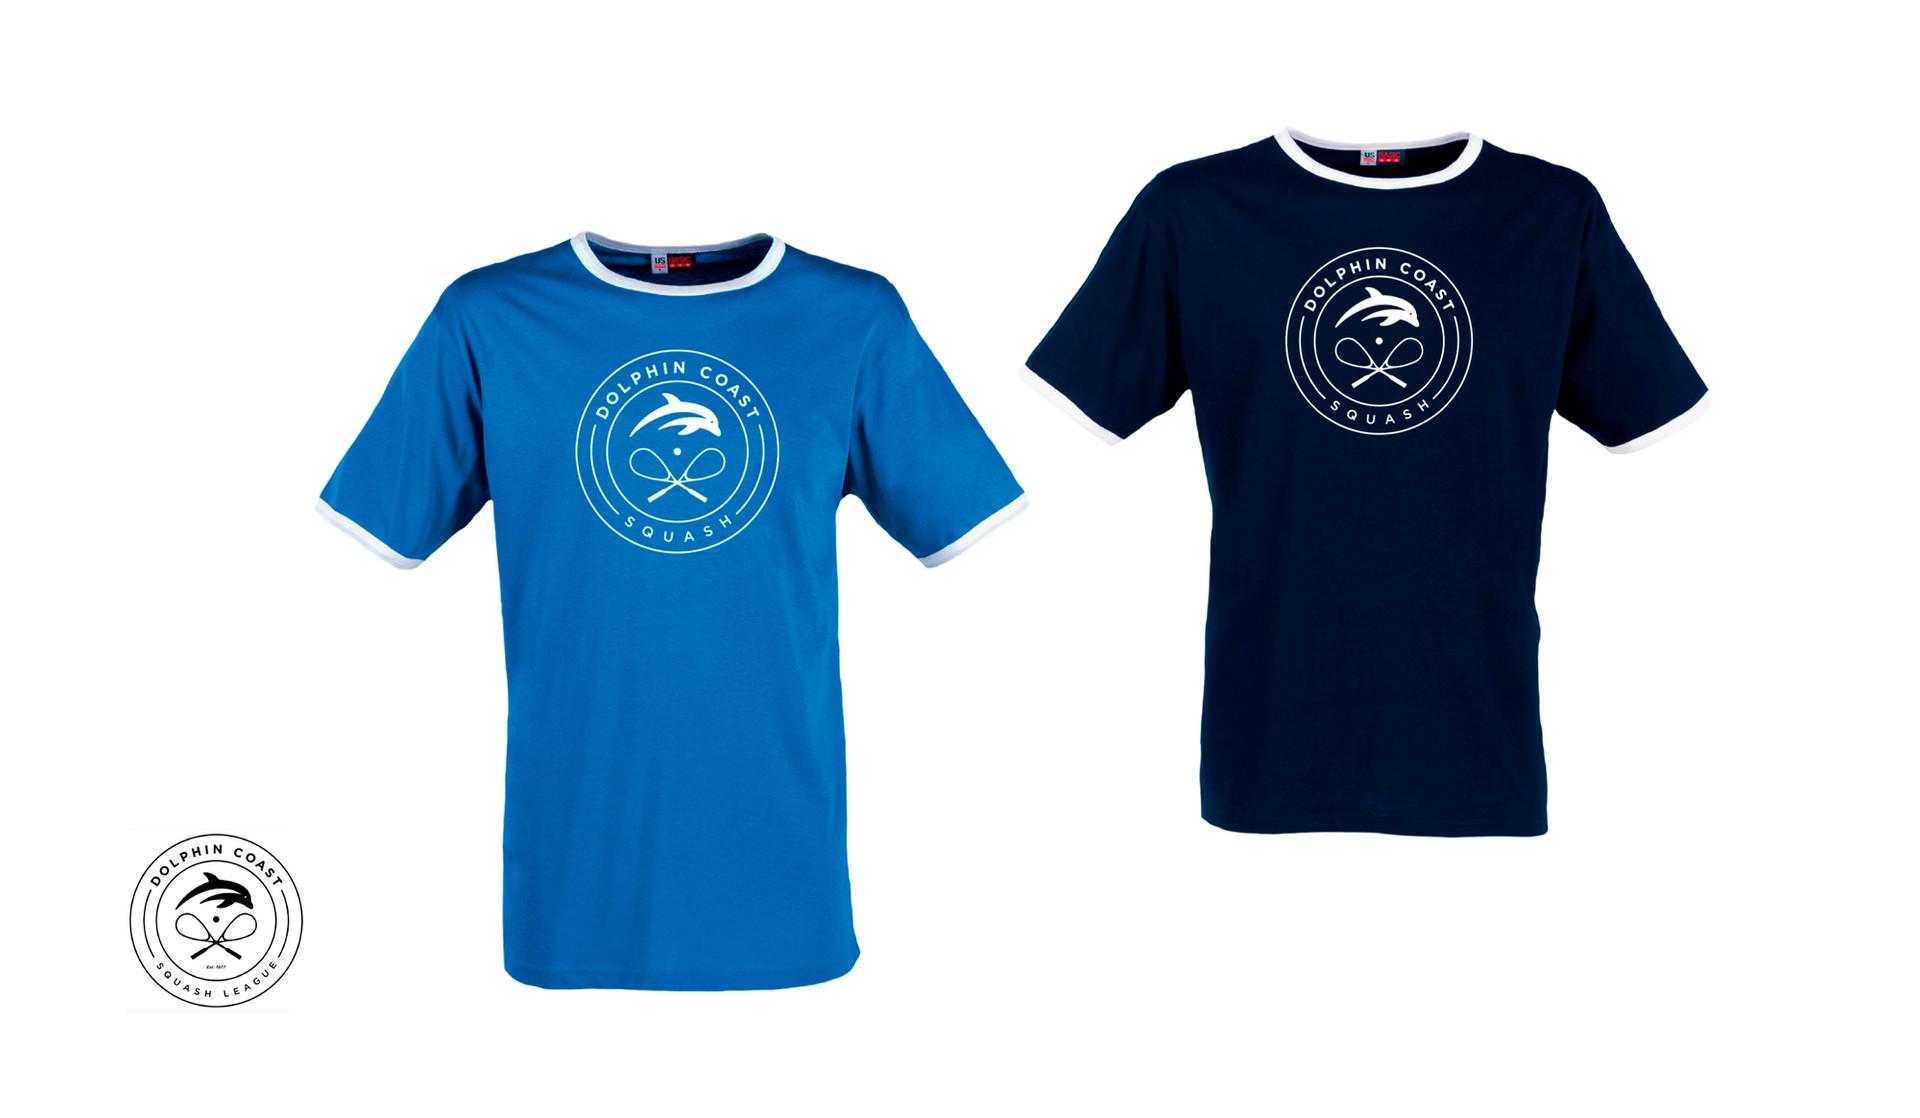 Dolphin-Coast-Squash-Club-logo-design-sh